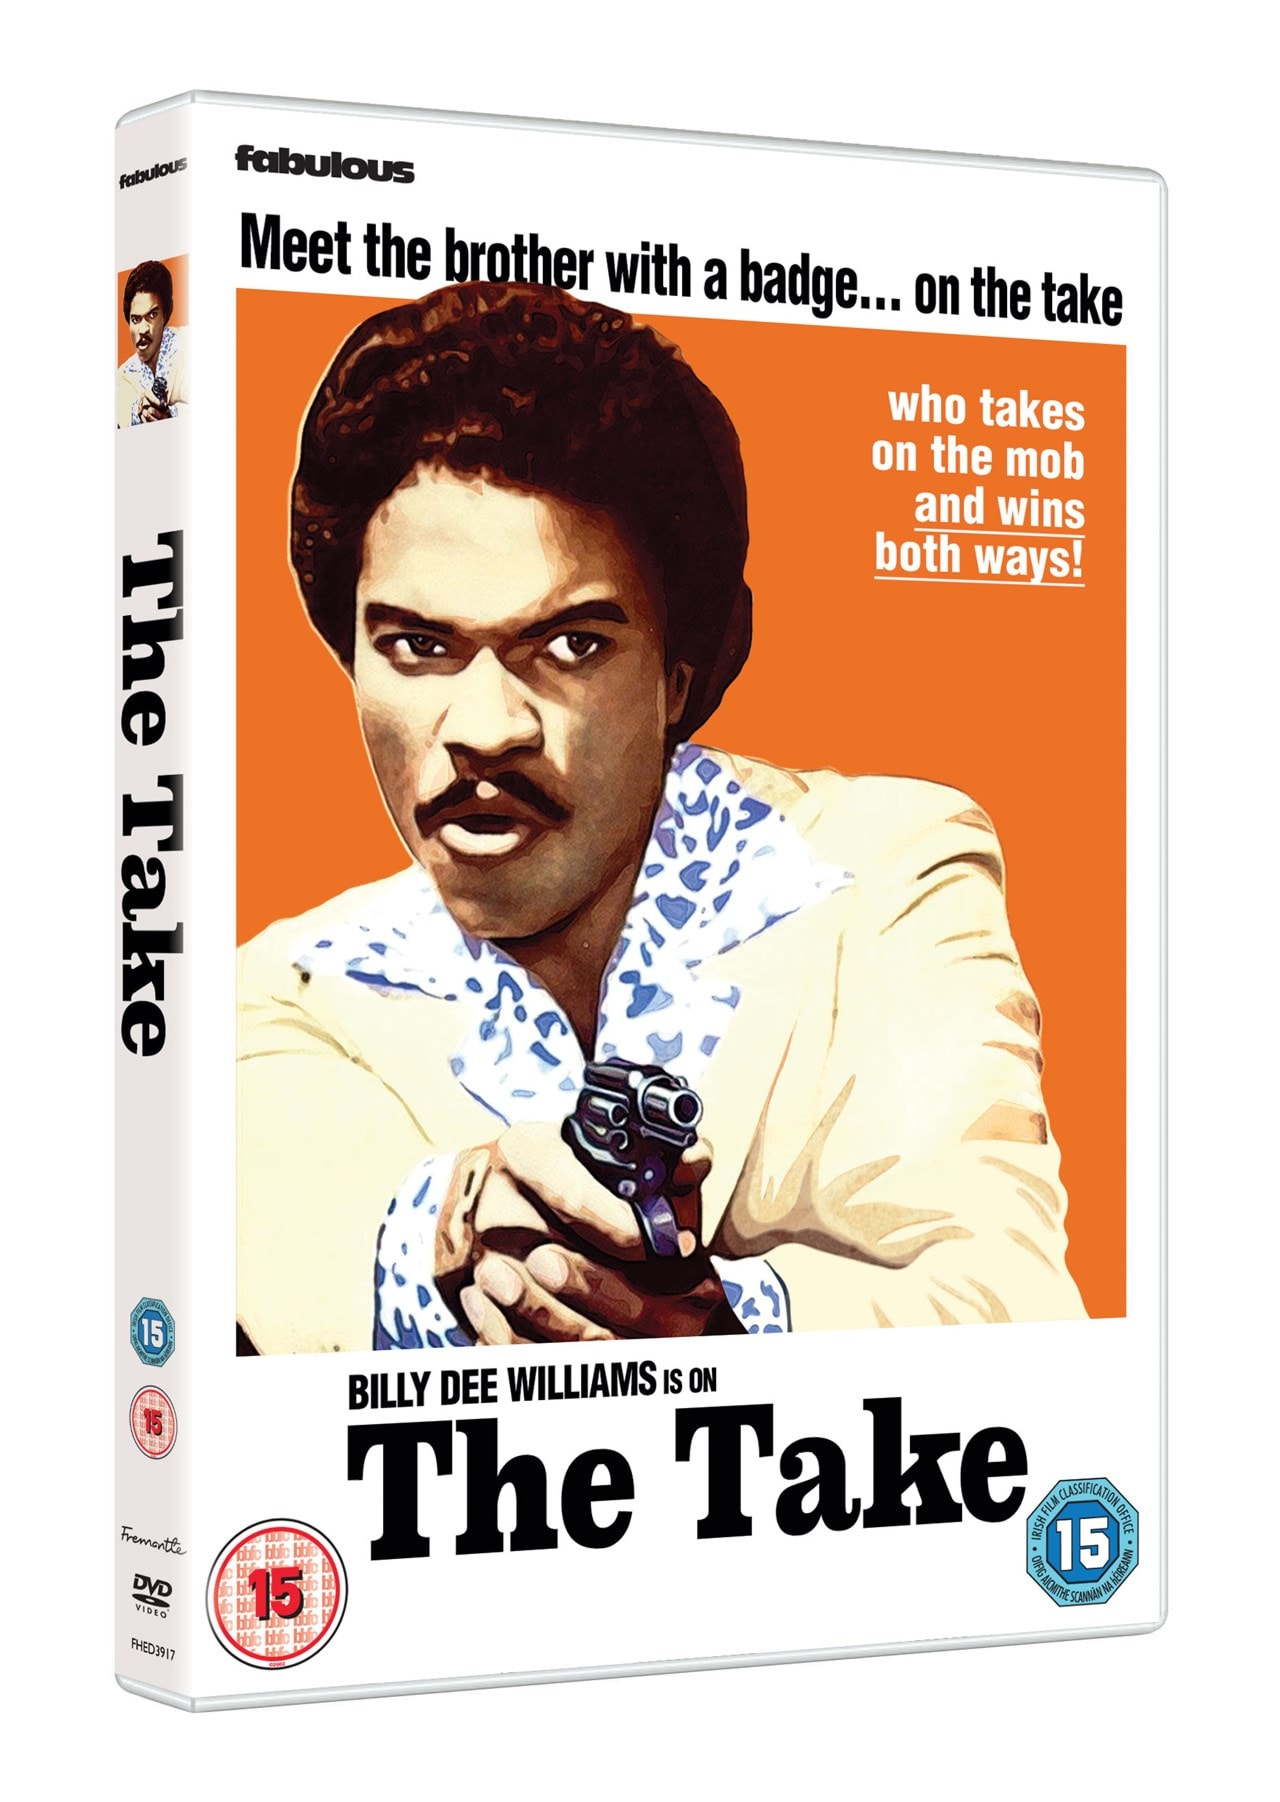 The Take - 2